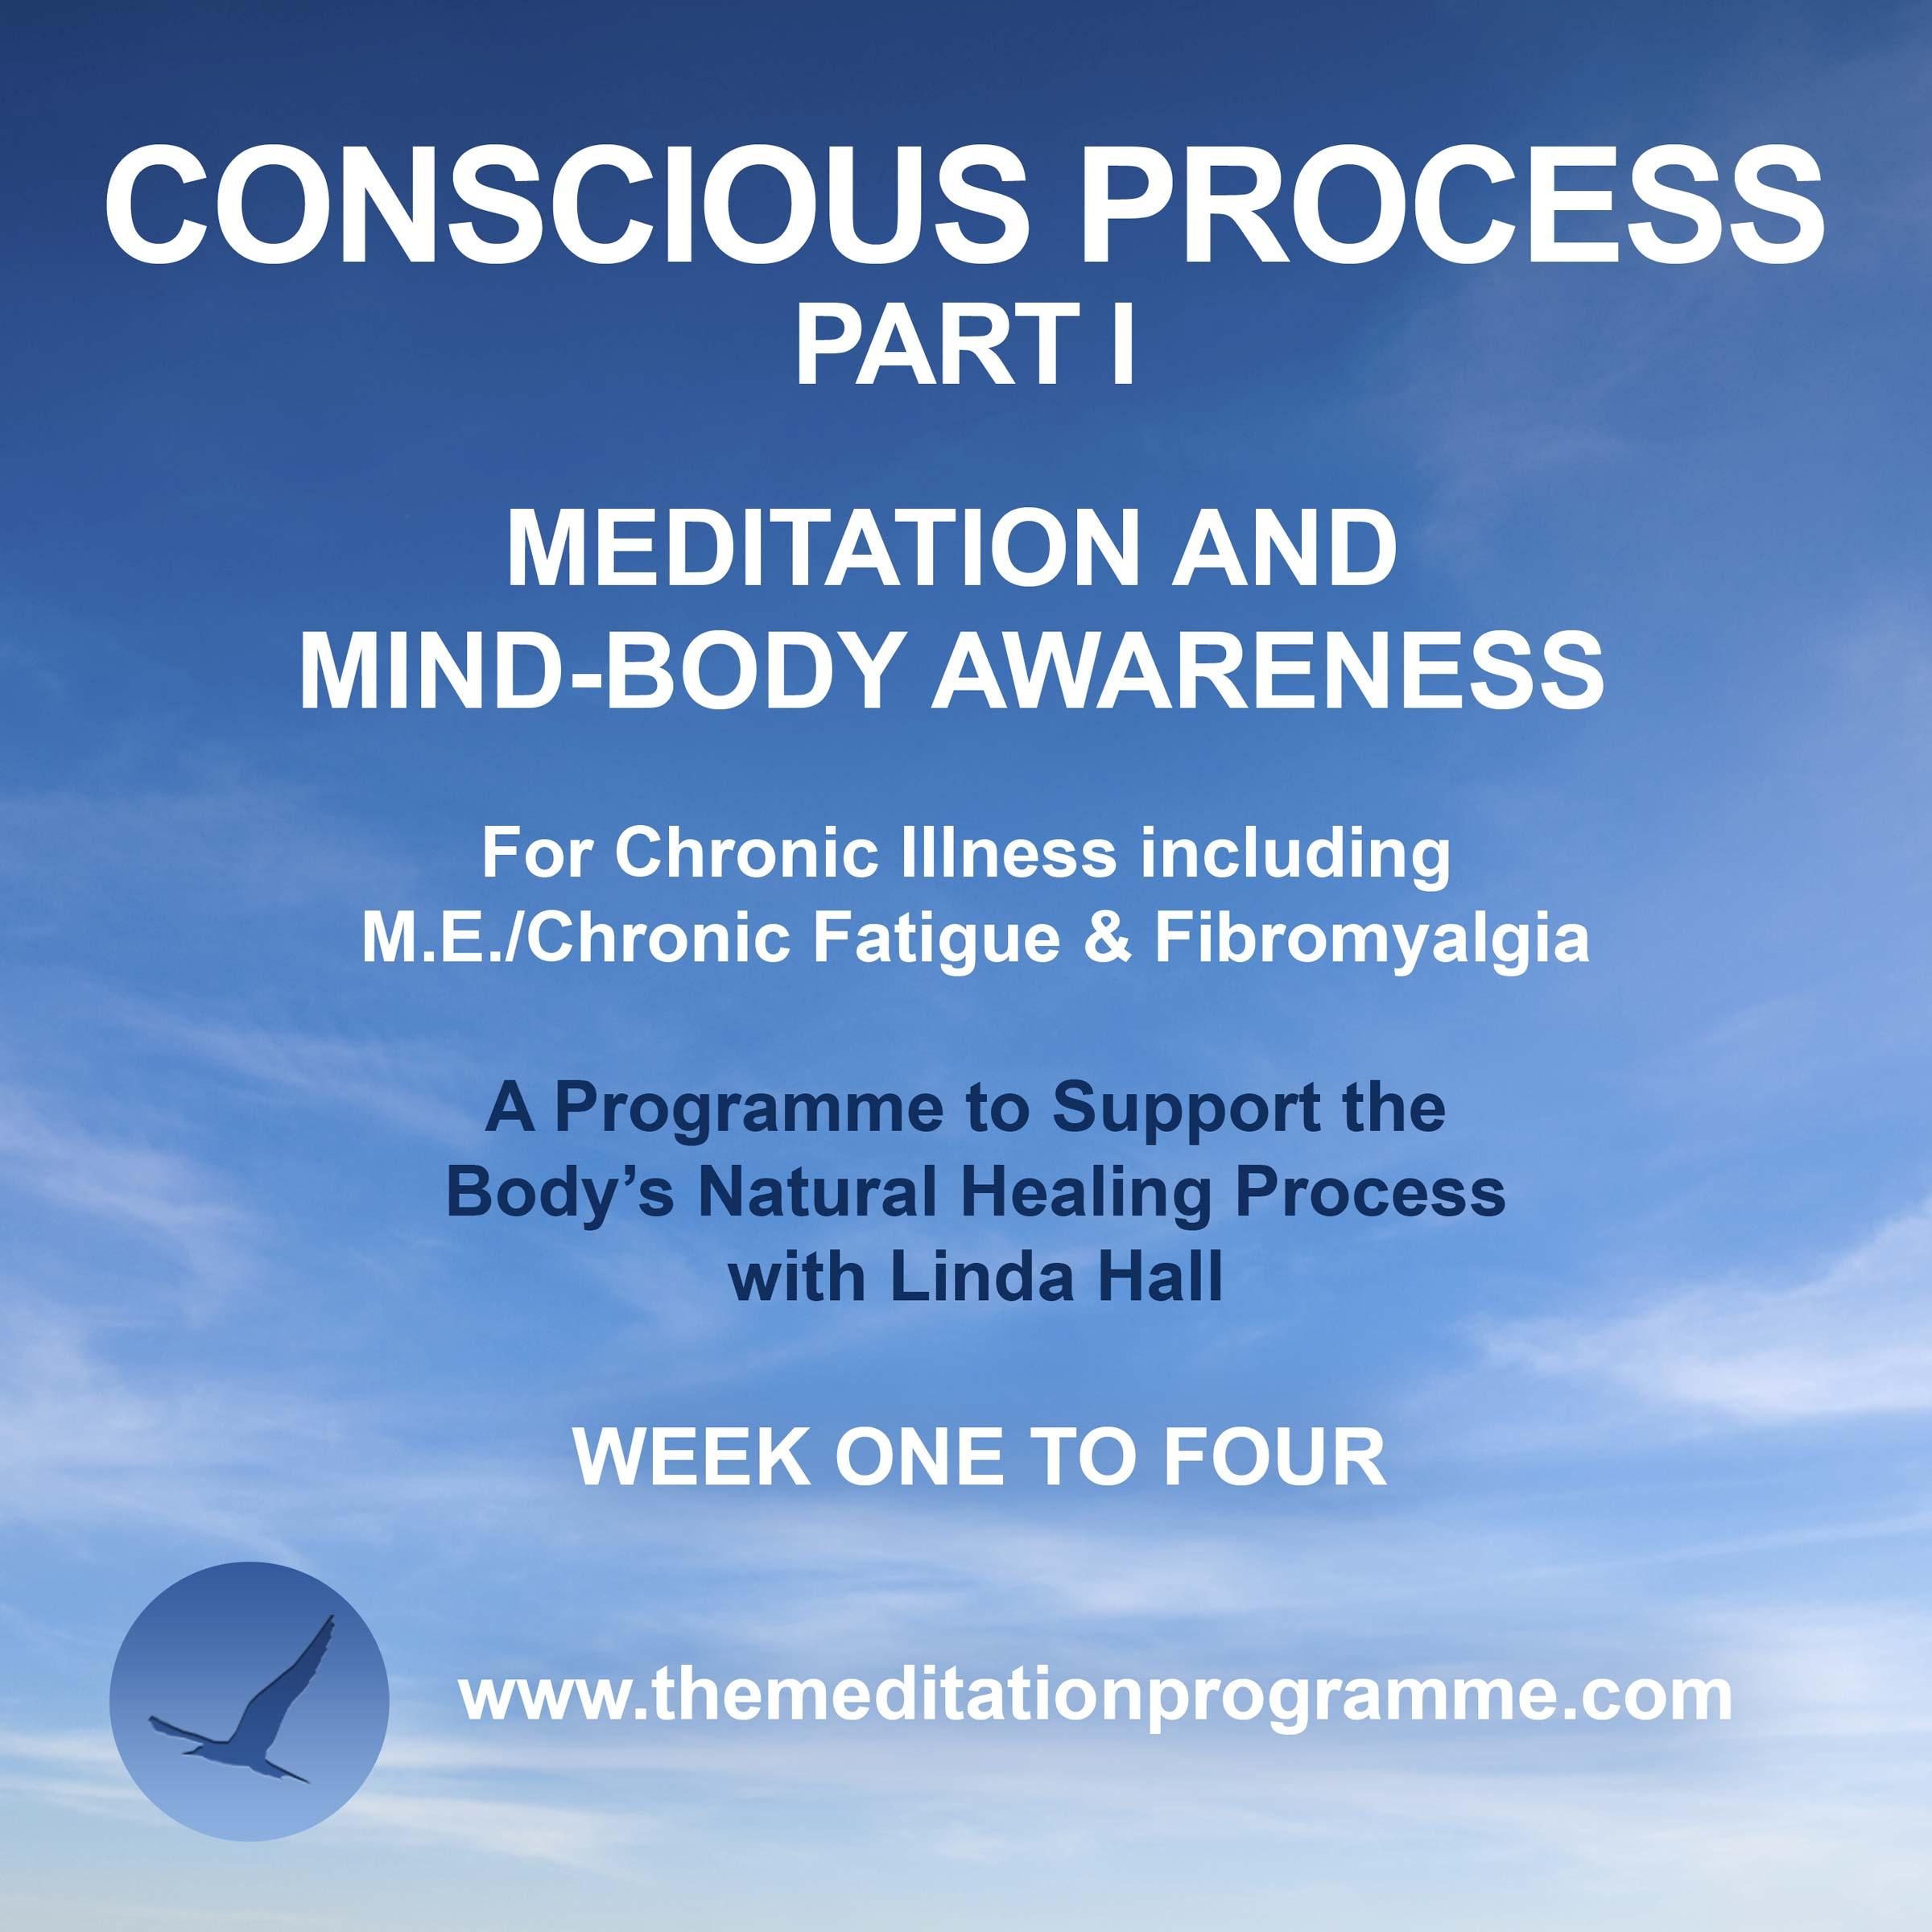 Conscious-Process-Part-1